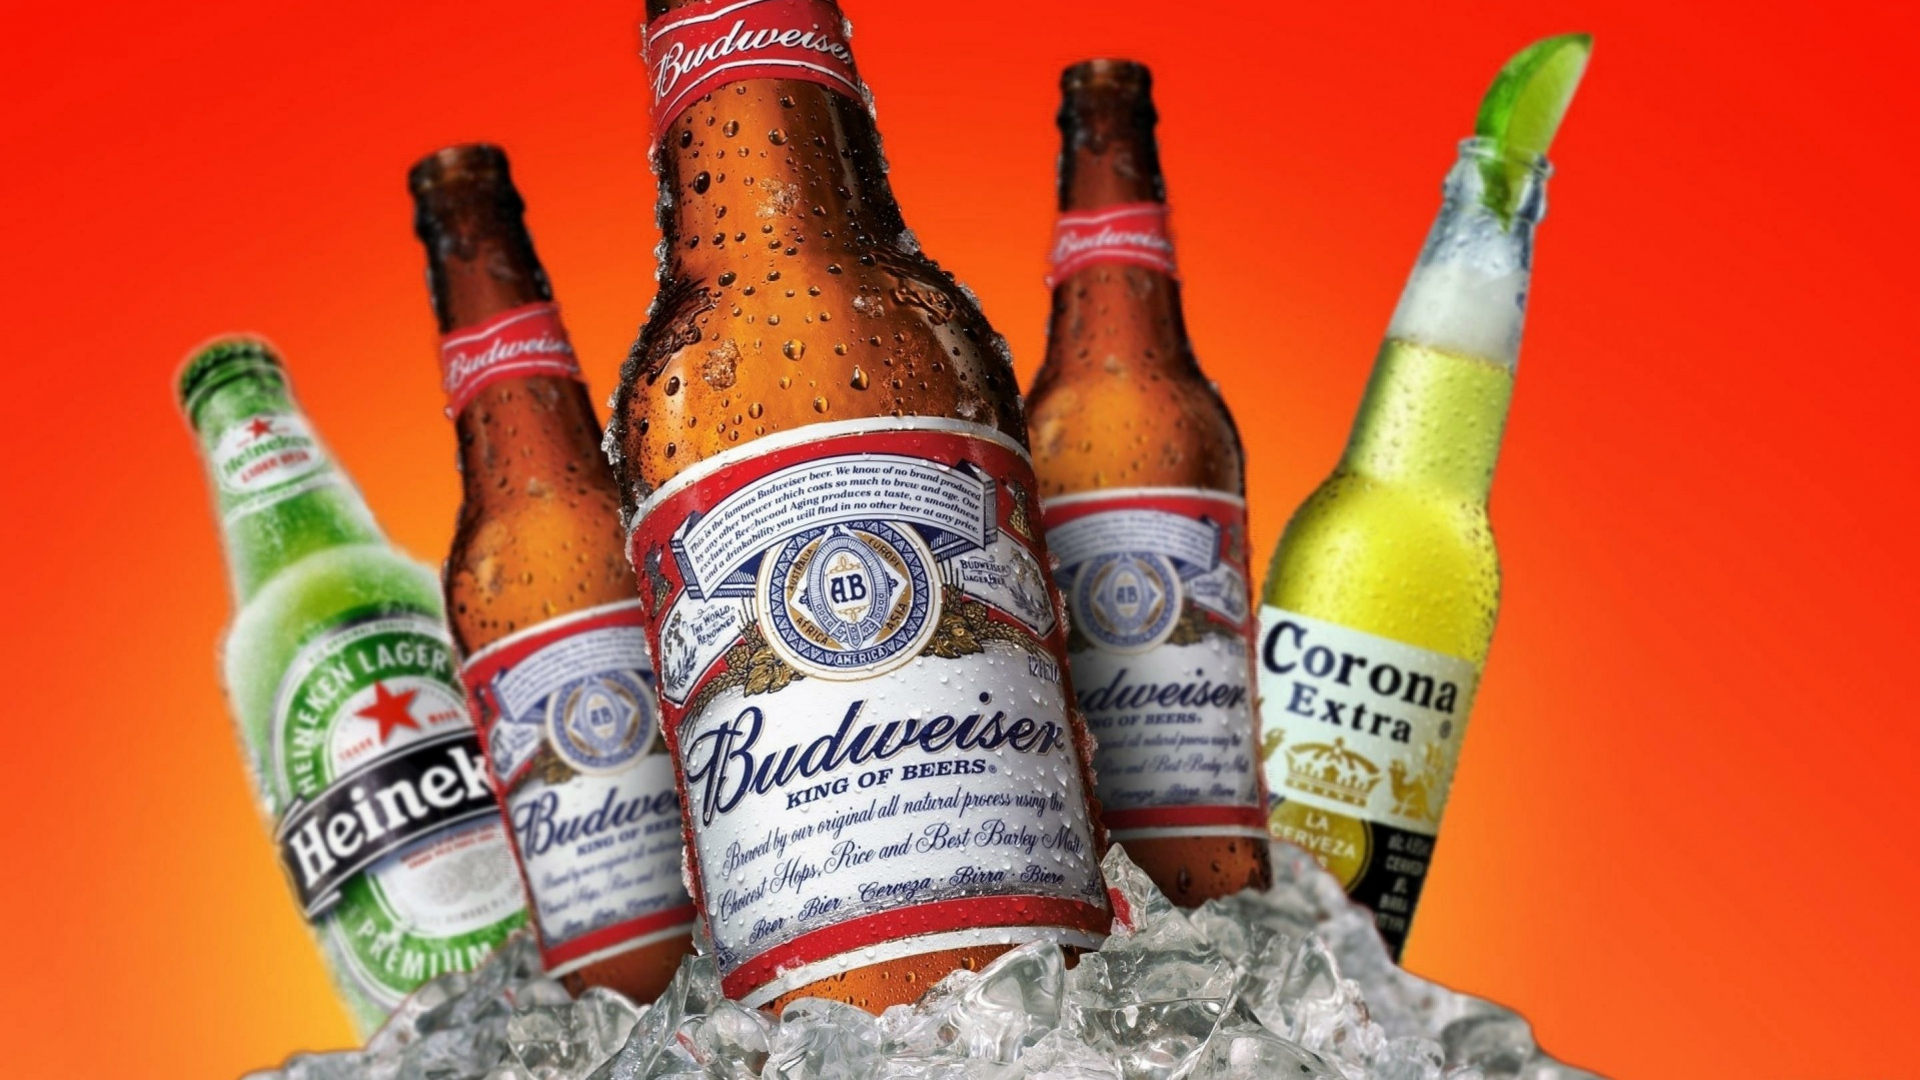 hd hintergrundbilder heineken budweiser corona bier getränke eis 1920x1080